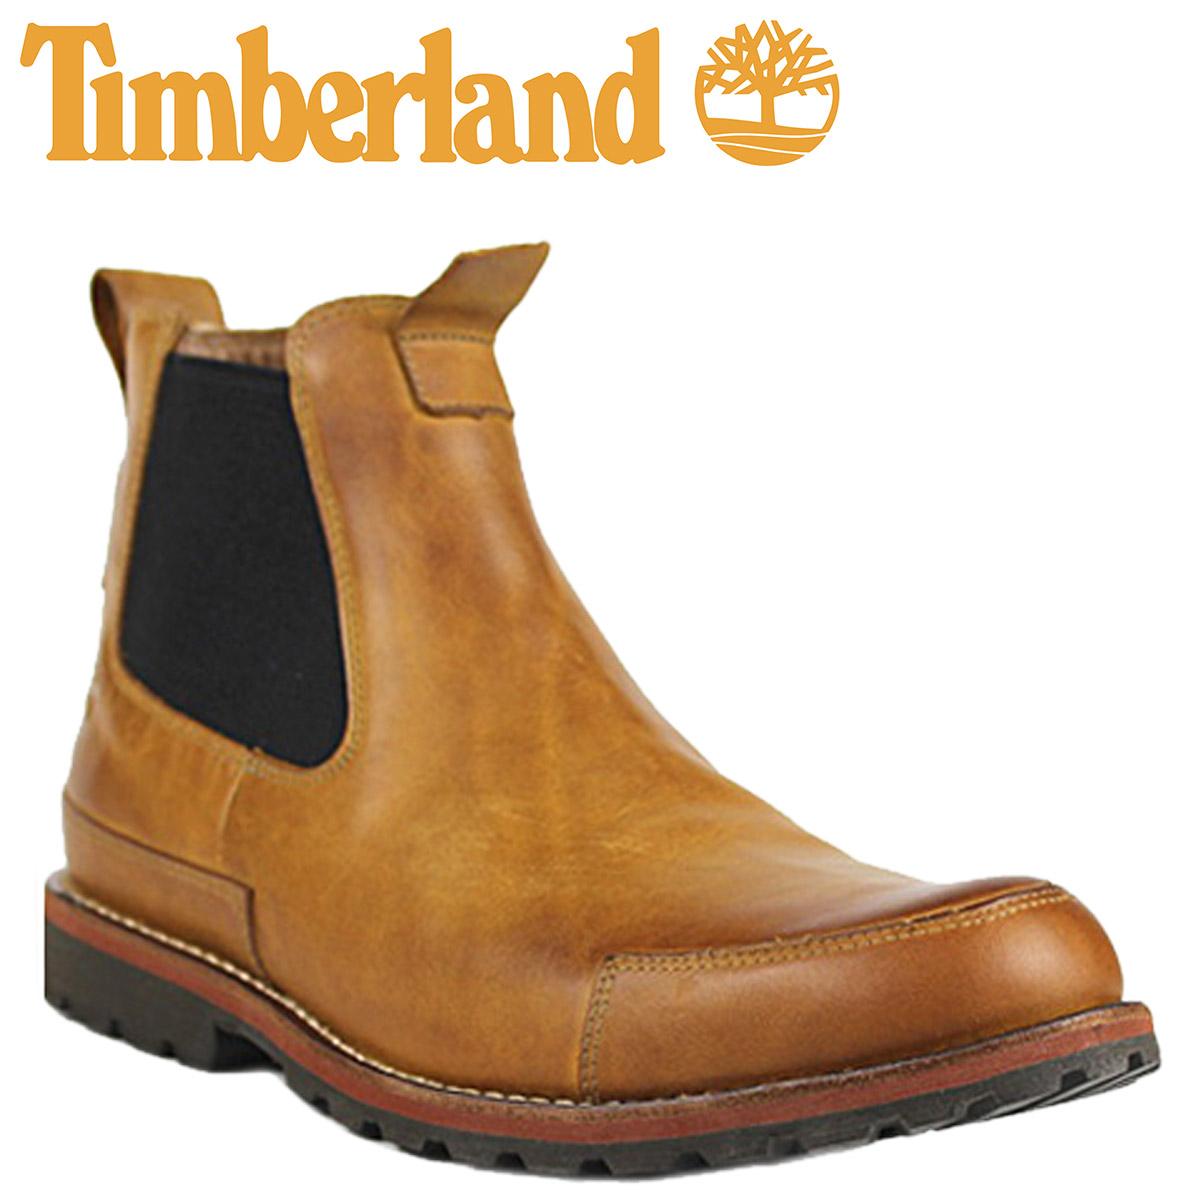 776a86a02e82 Timberland Timberland Earthkeepers Chelsea boots 5509R Earthkeepers Chelsea  Boot oil leather mens WHEAT